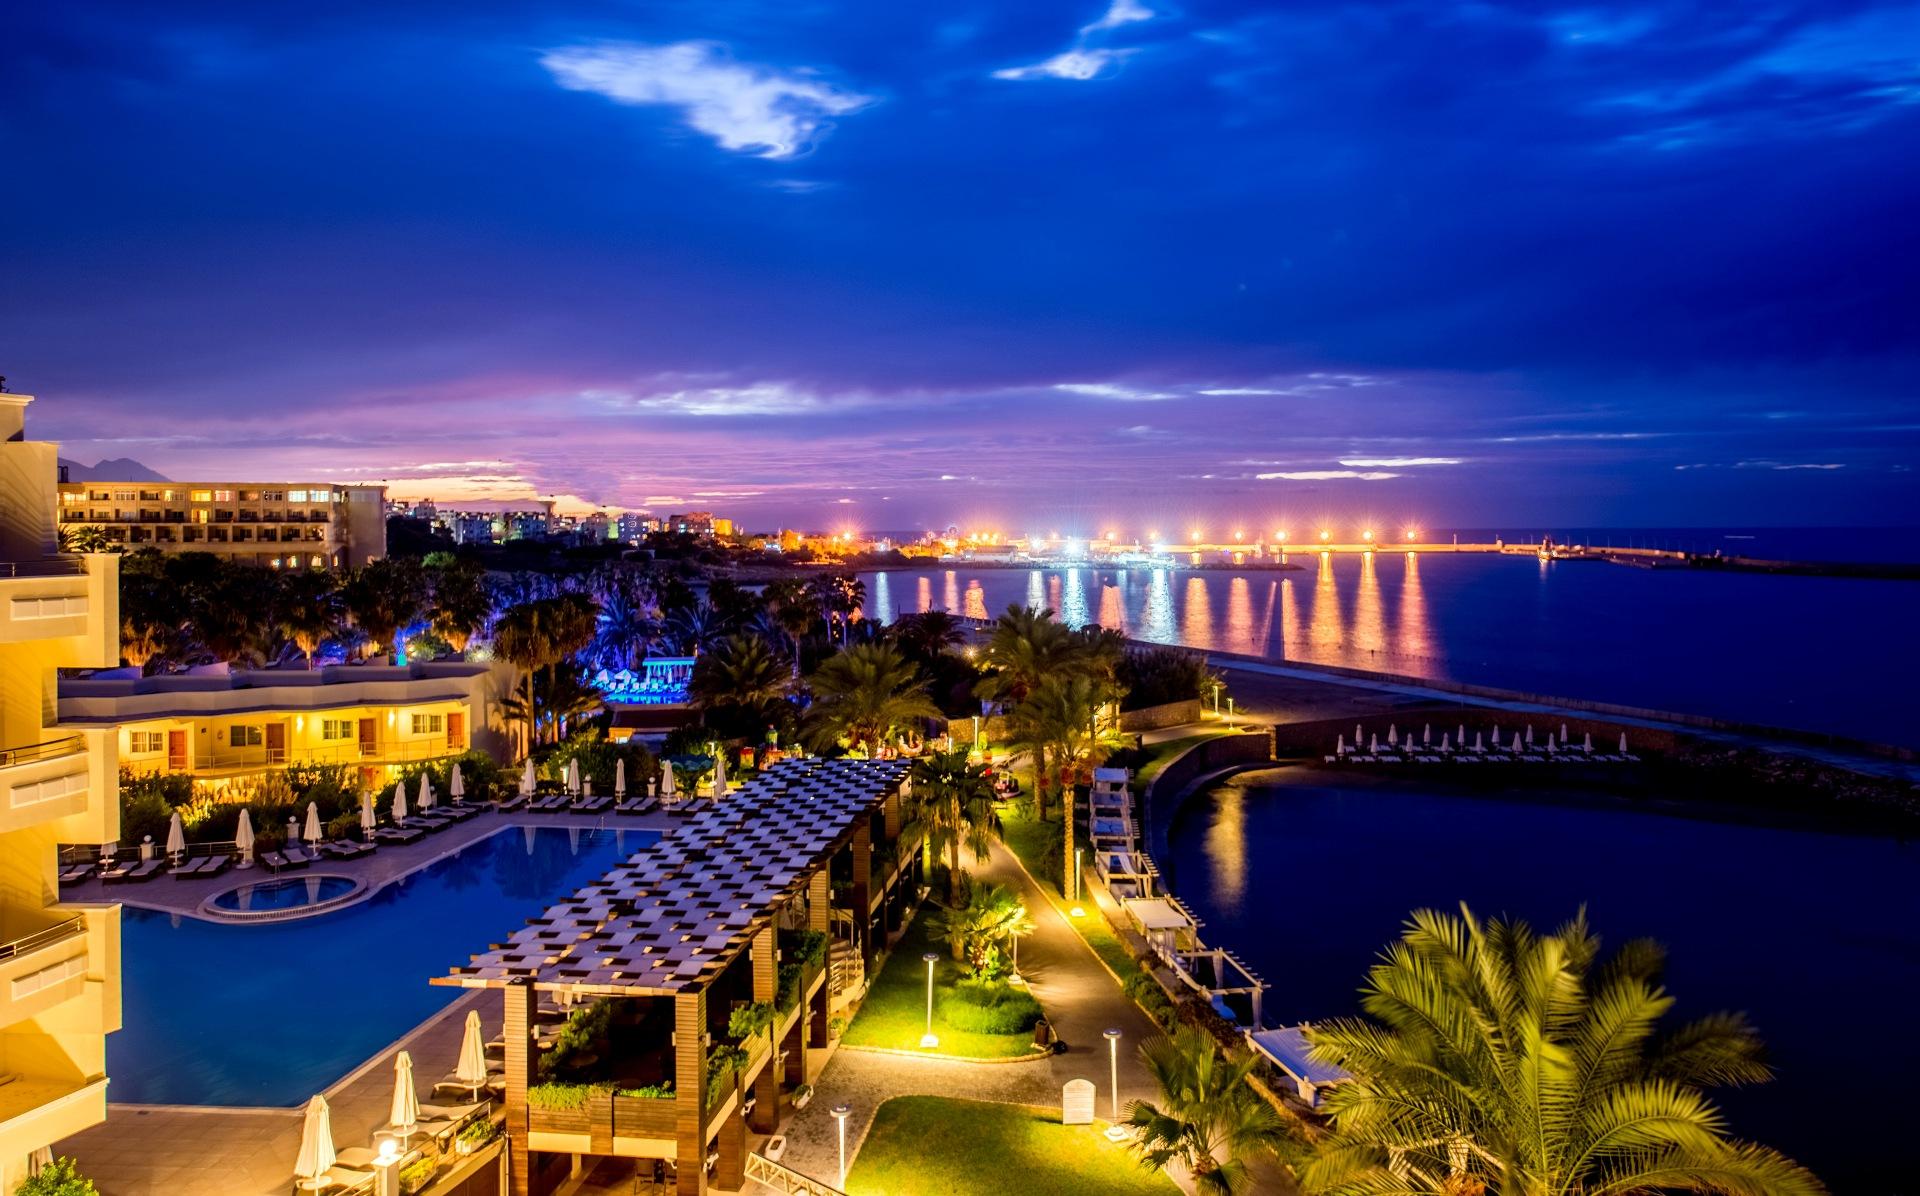 Vuni Palace Hotel & Casino